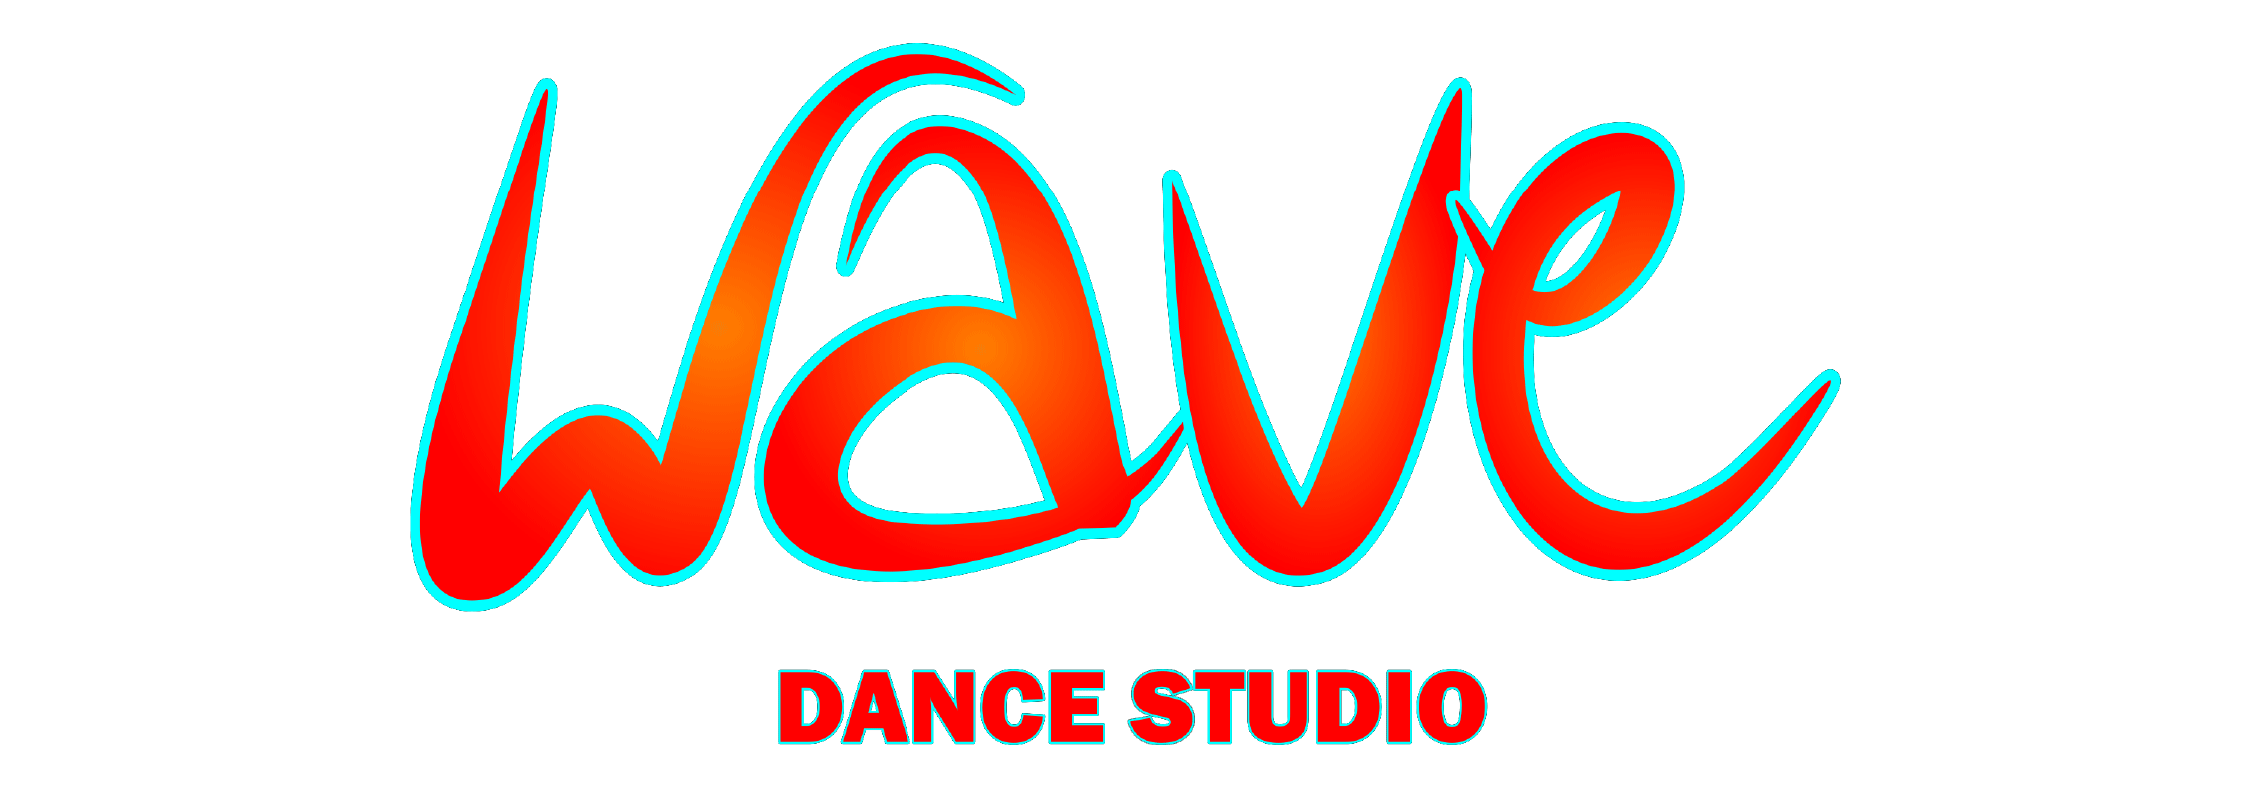 Wave Dance Studio